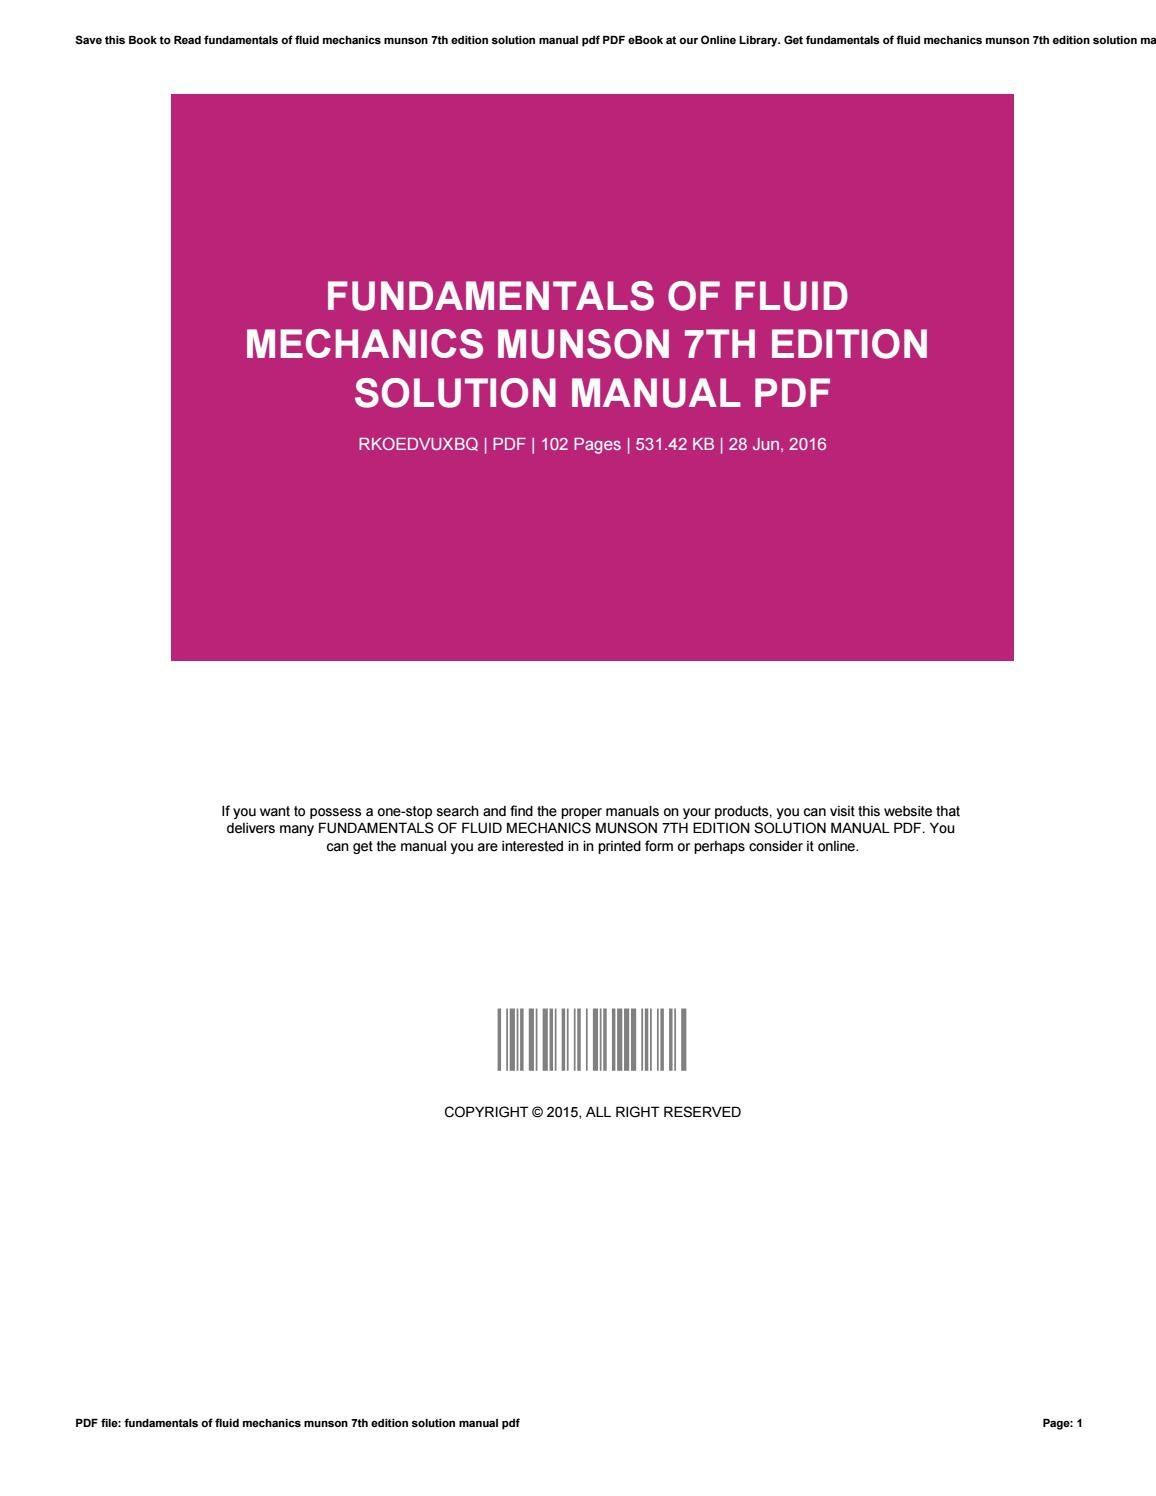 mechanics of machines solution manual pdf